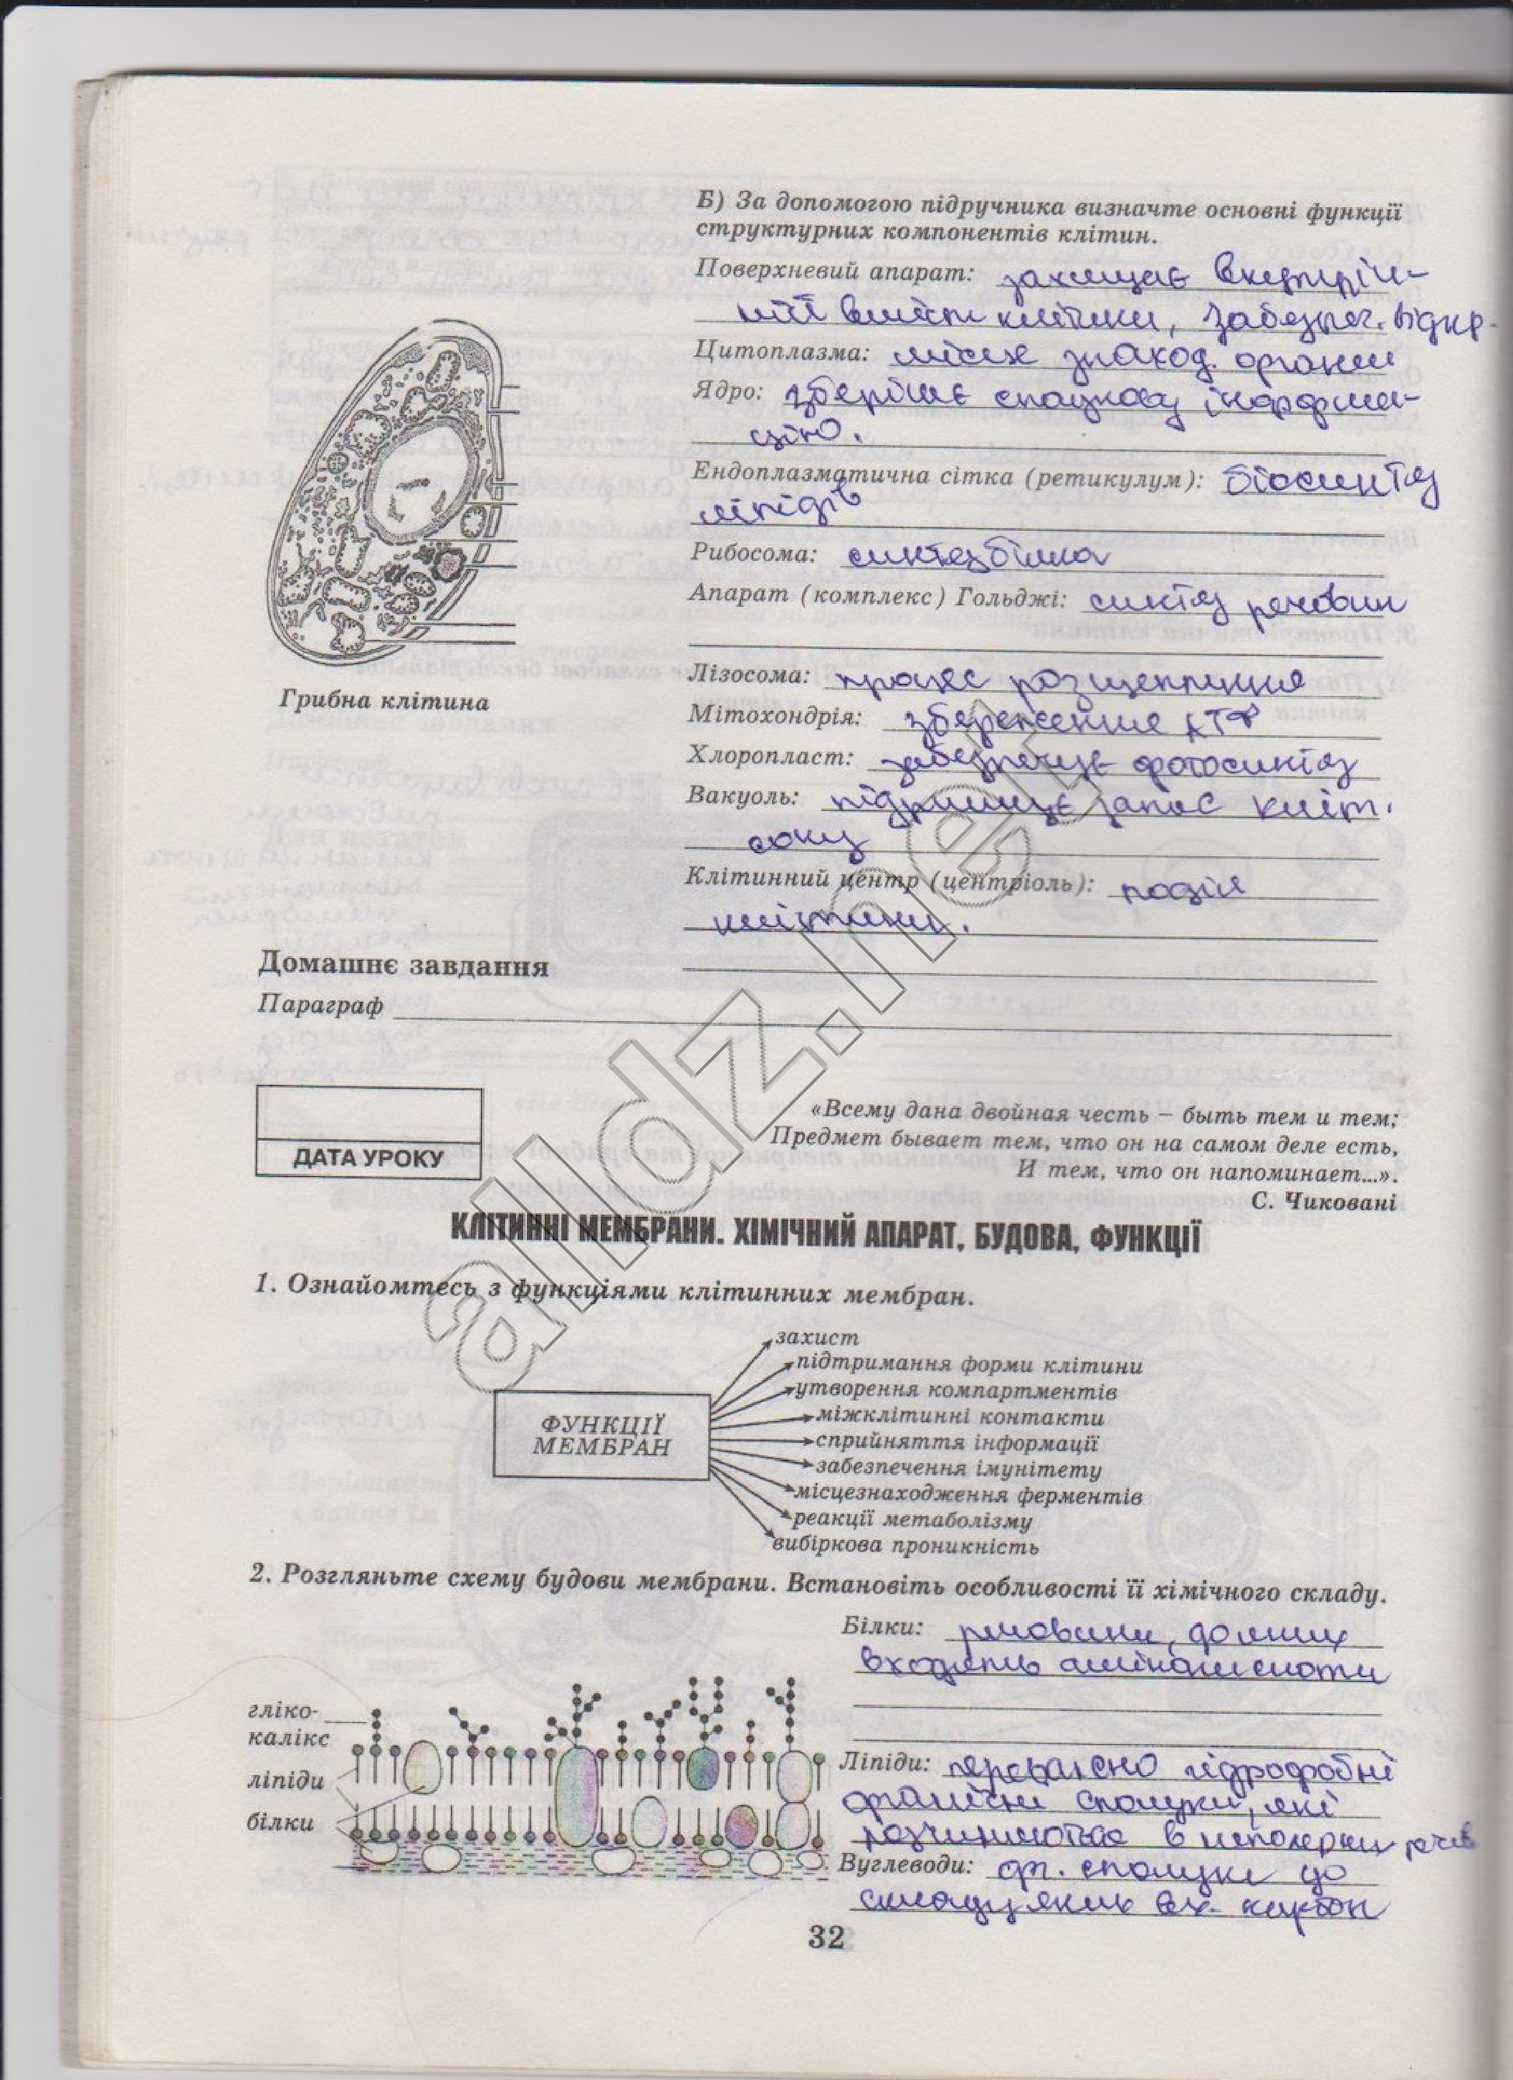 биология гдз 8 класс яременко